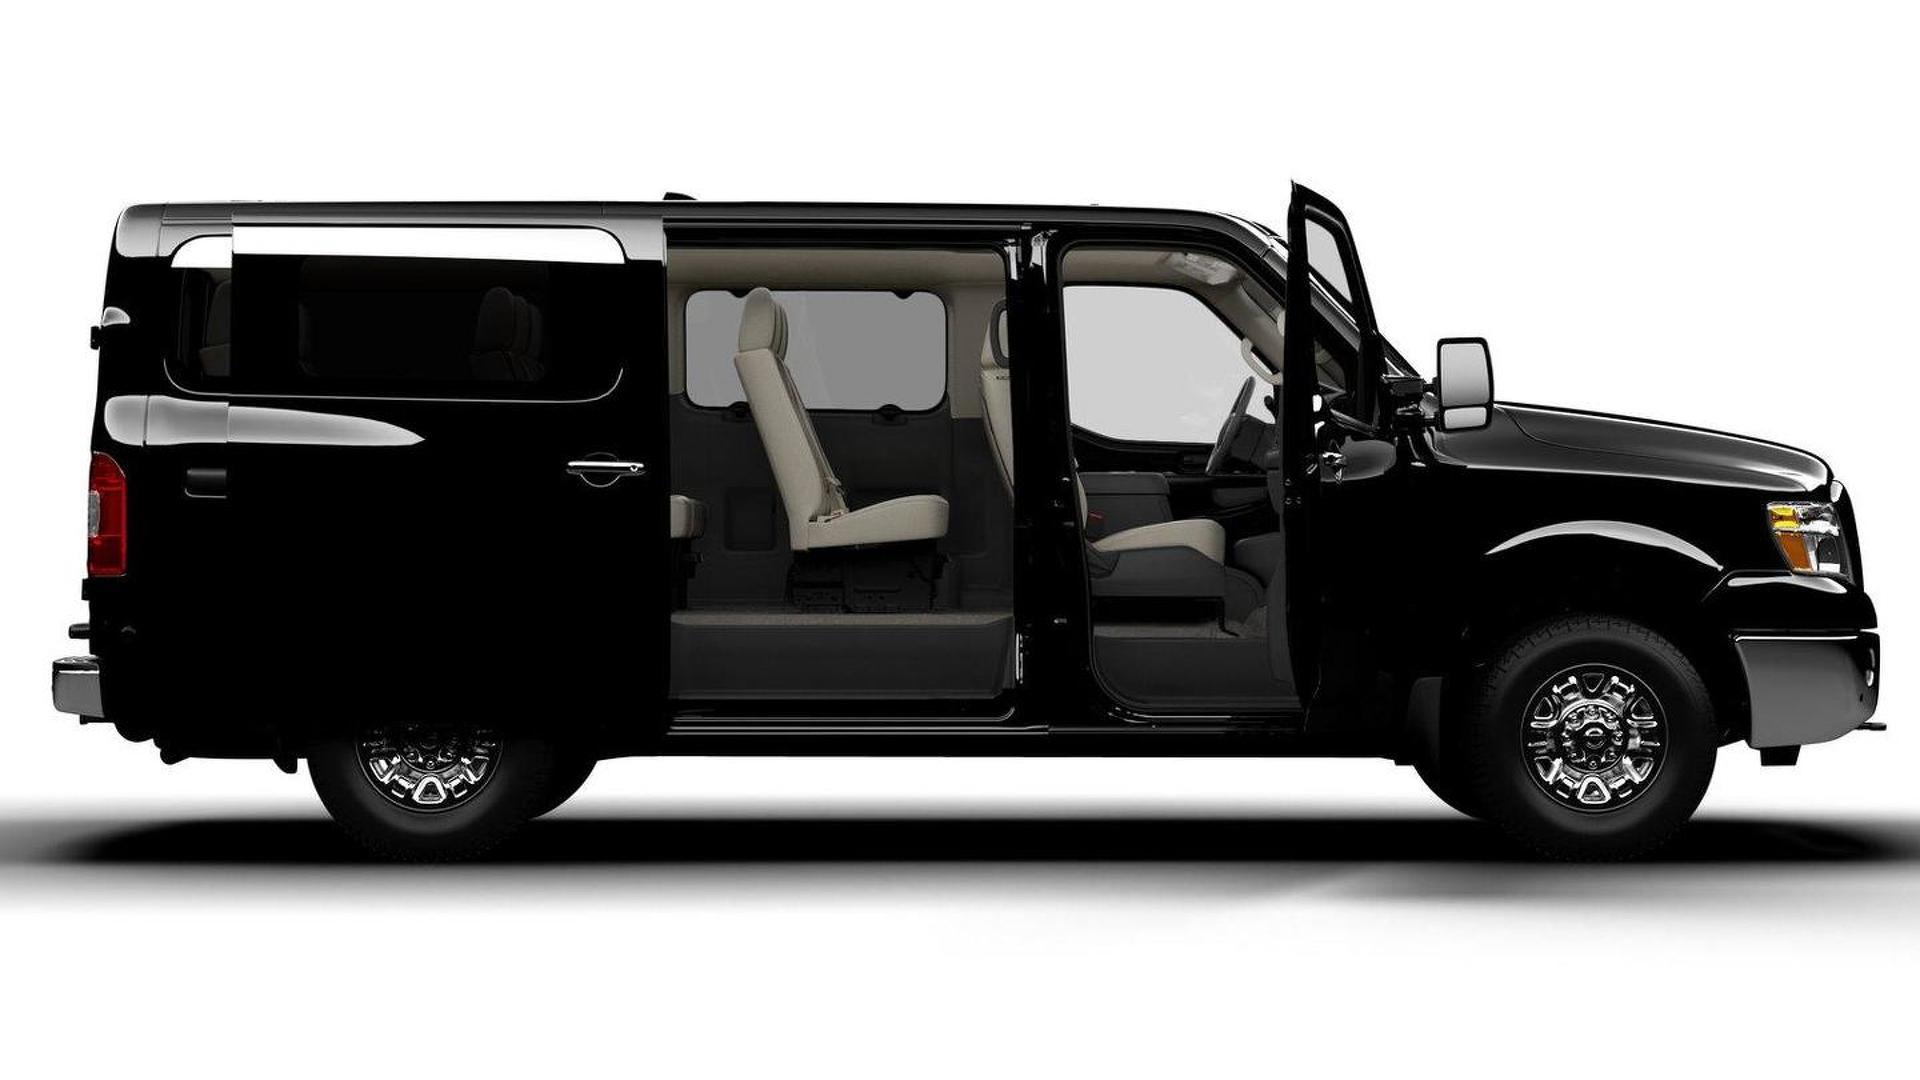 Nissan Passenger Van >> Nissan Announces All New 2012 Nv3500 Hd Passenger Van For North America